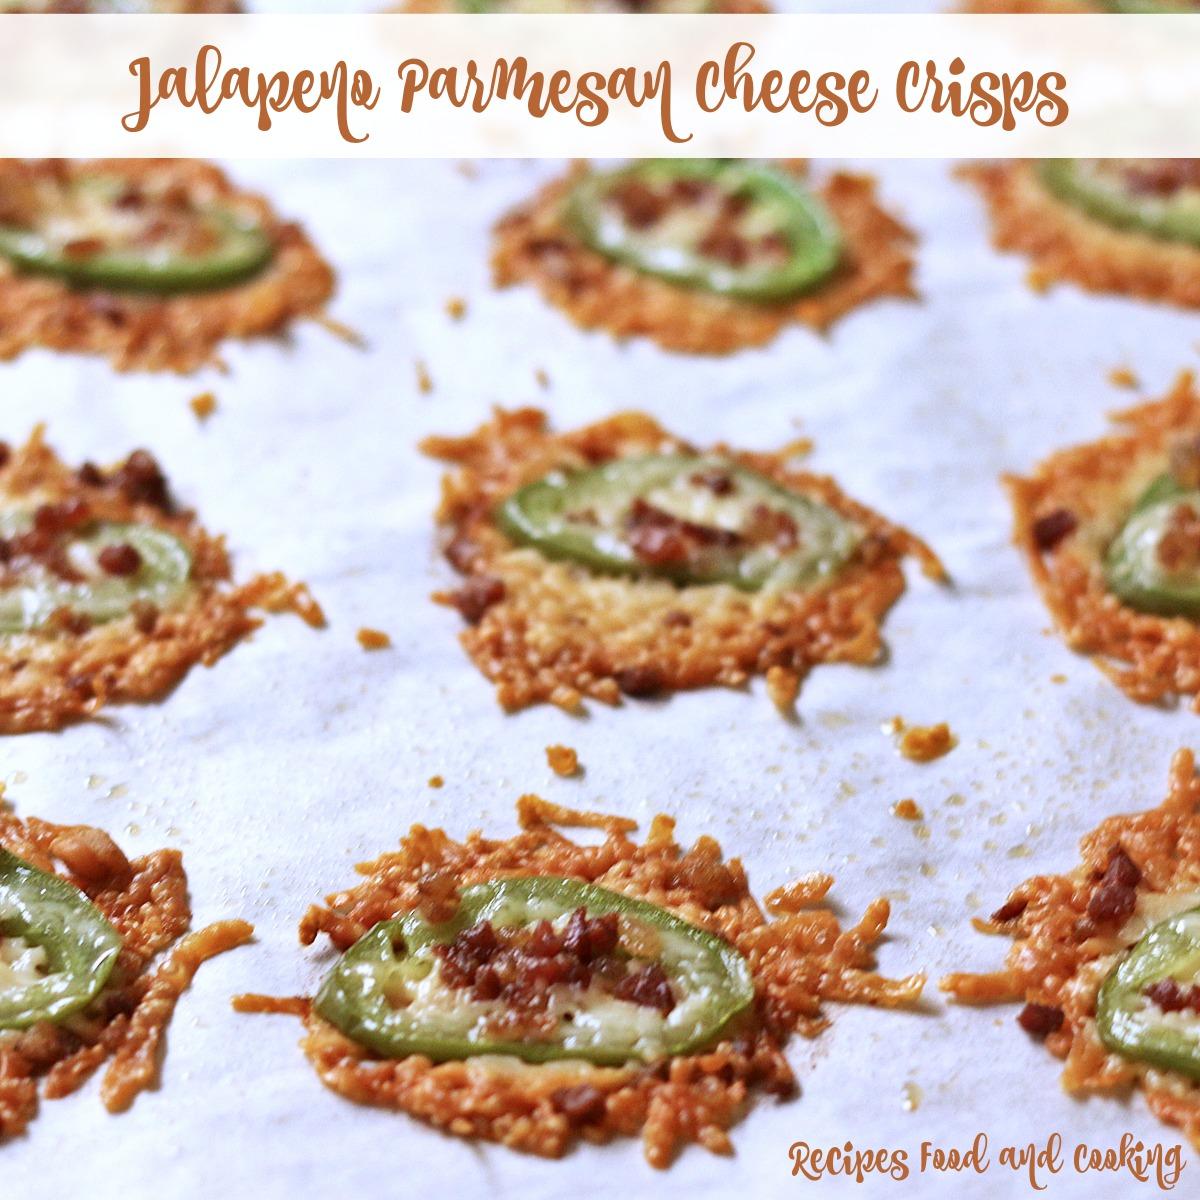 Jalapeno Parmesan Cheese Crisps